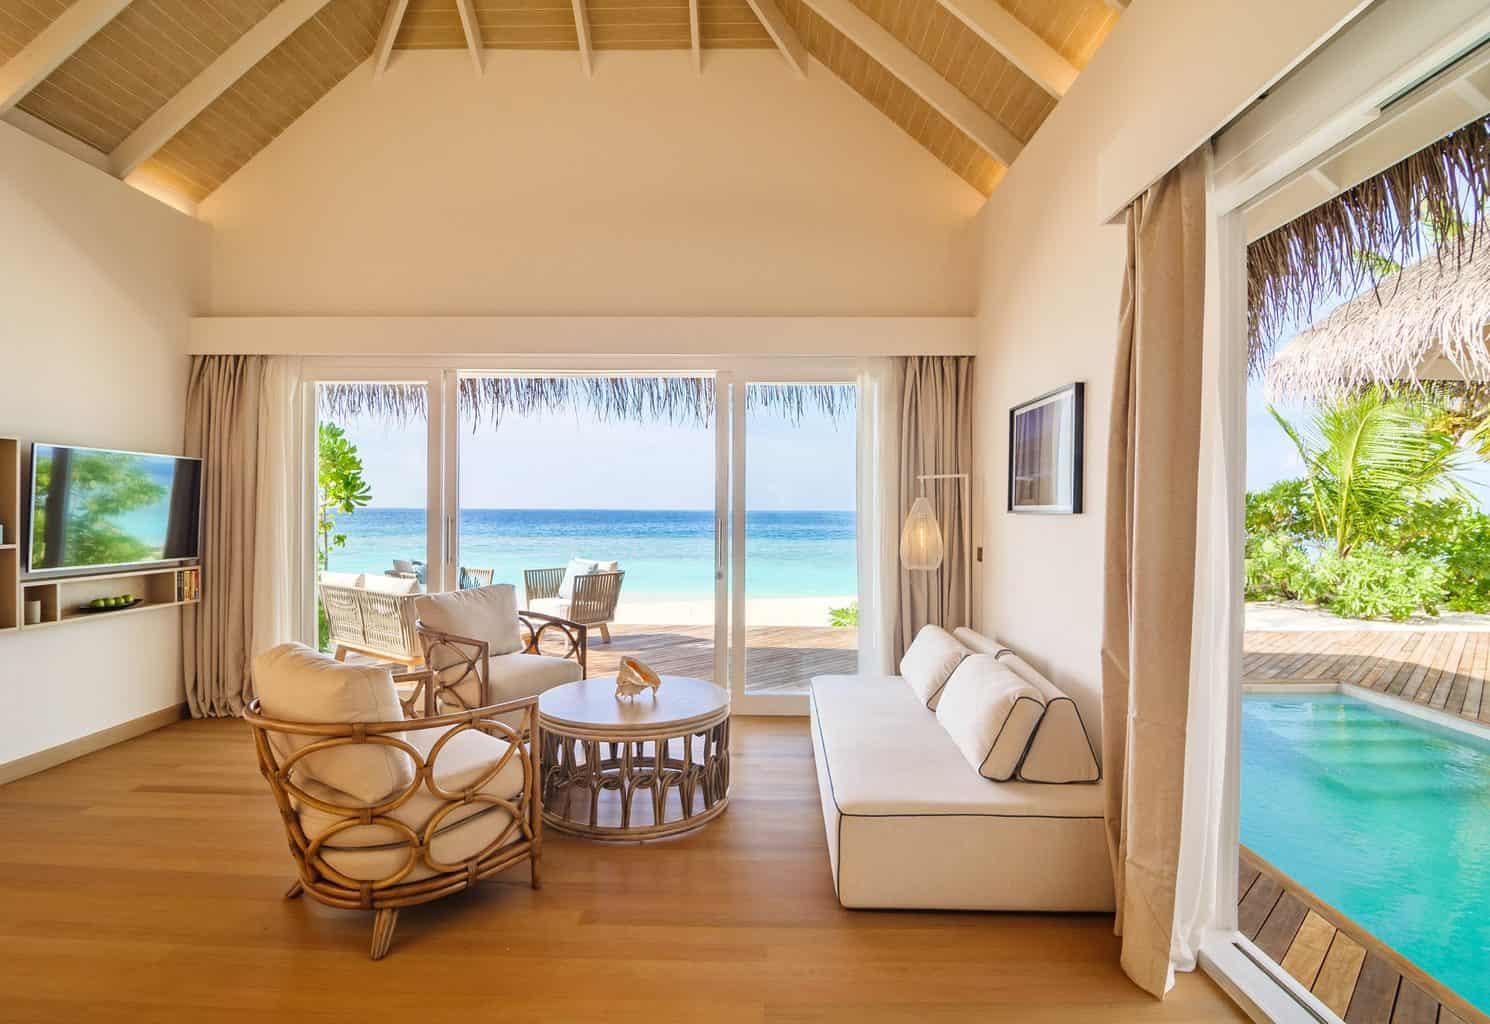 Hoteis-para-Lua-de-Mel-nas-Maldivas-Baglioni-5-scaled